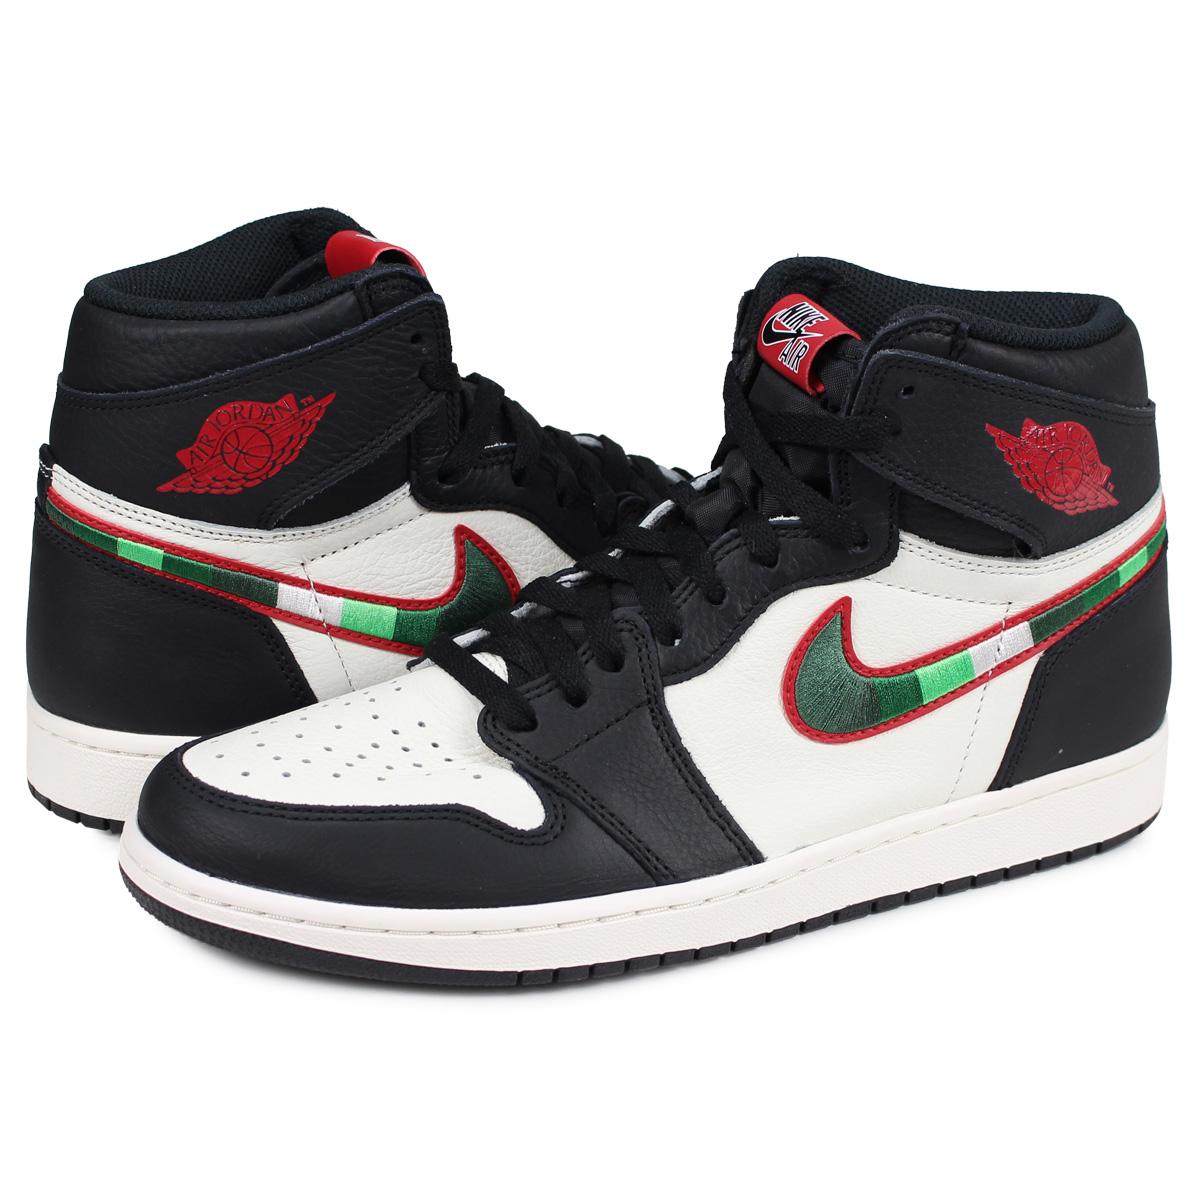 f1ab815c8c1031 Nike NIKE Air Jordan 1 nostalgic high sneakers men AIR JORDAN 1 RETRO HIGH  OG SPORTS ILLUSTRATED black black 555